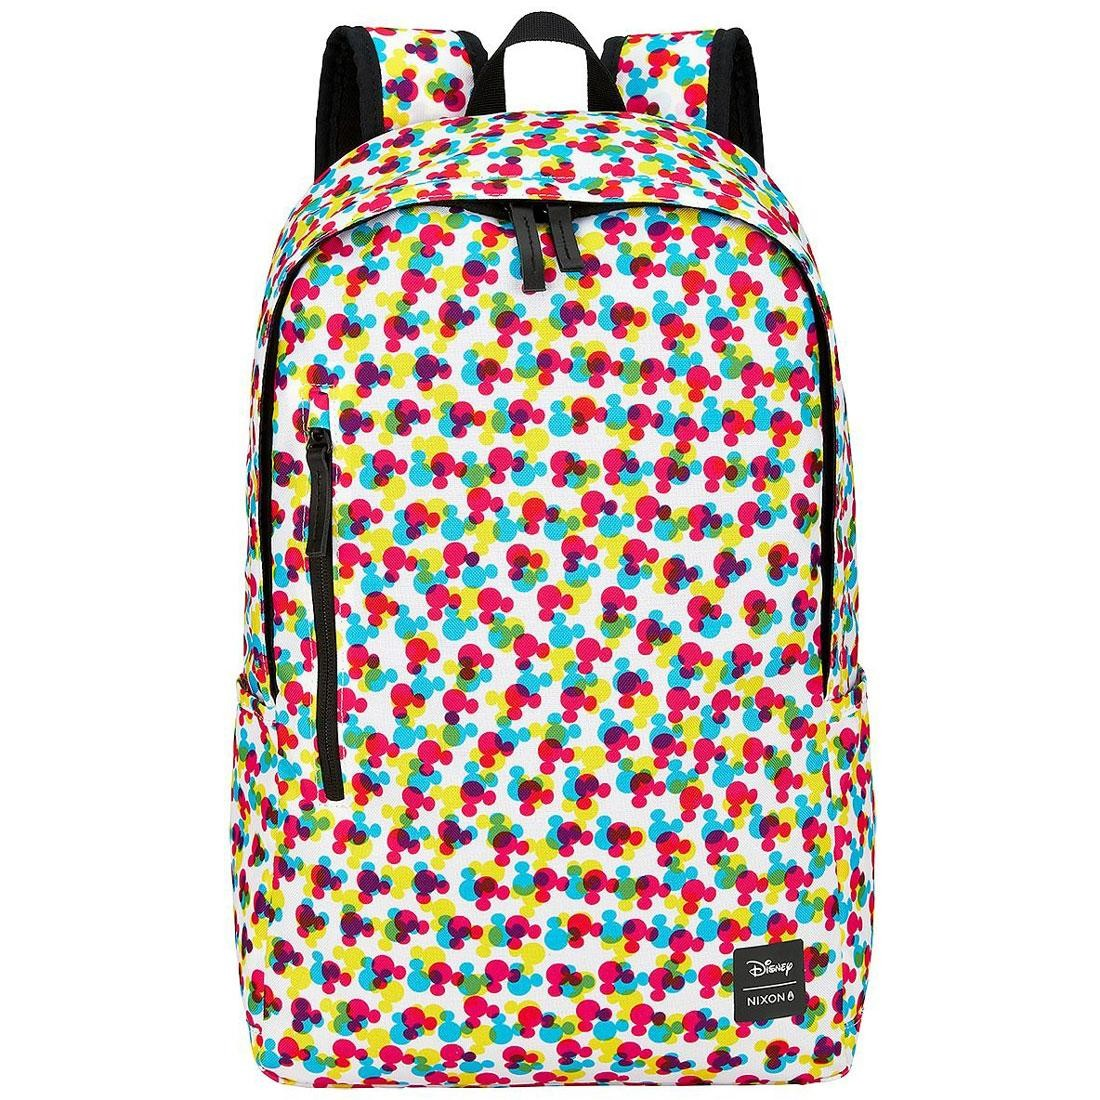 Nixon x Disney Smith SE II Backpack - Mickey (multi)